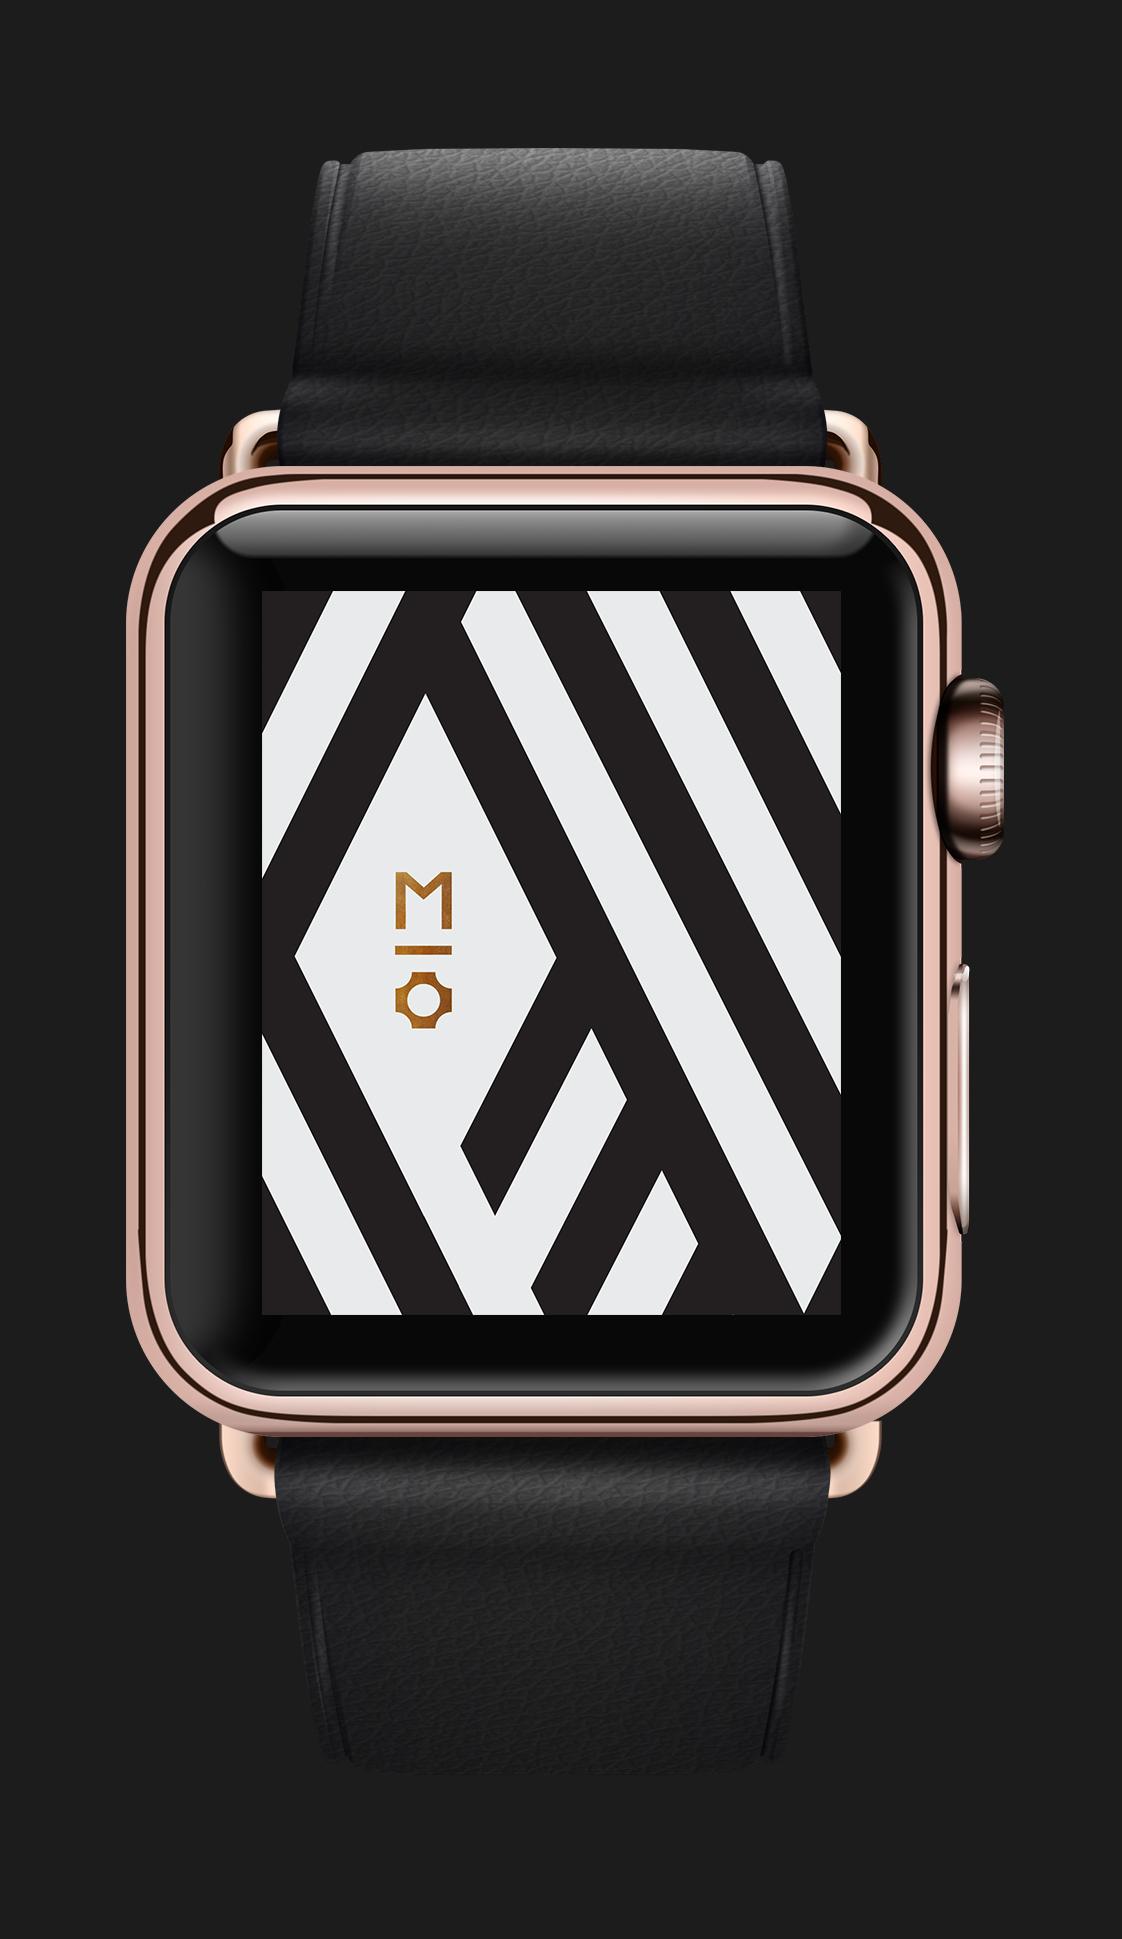 the-mark-apple-watch.jpg